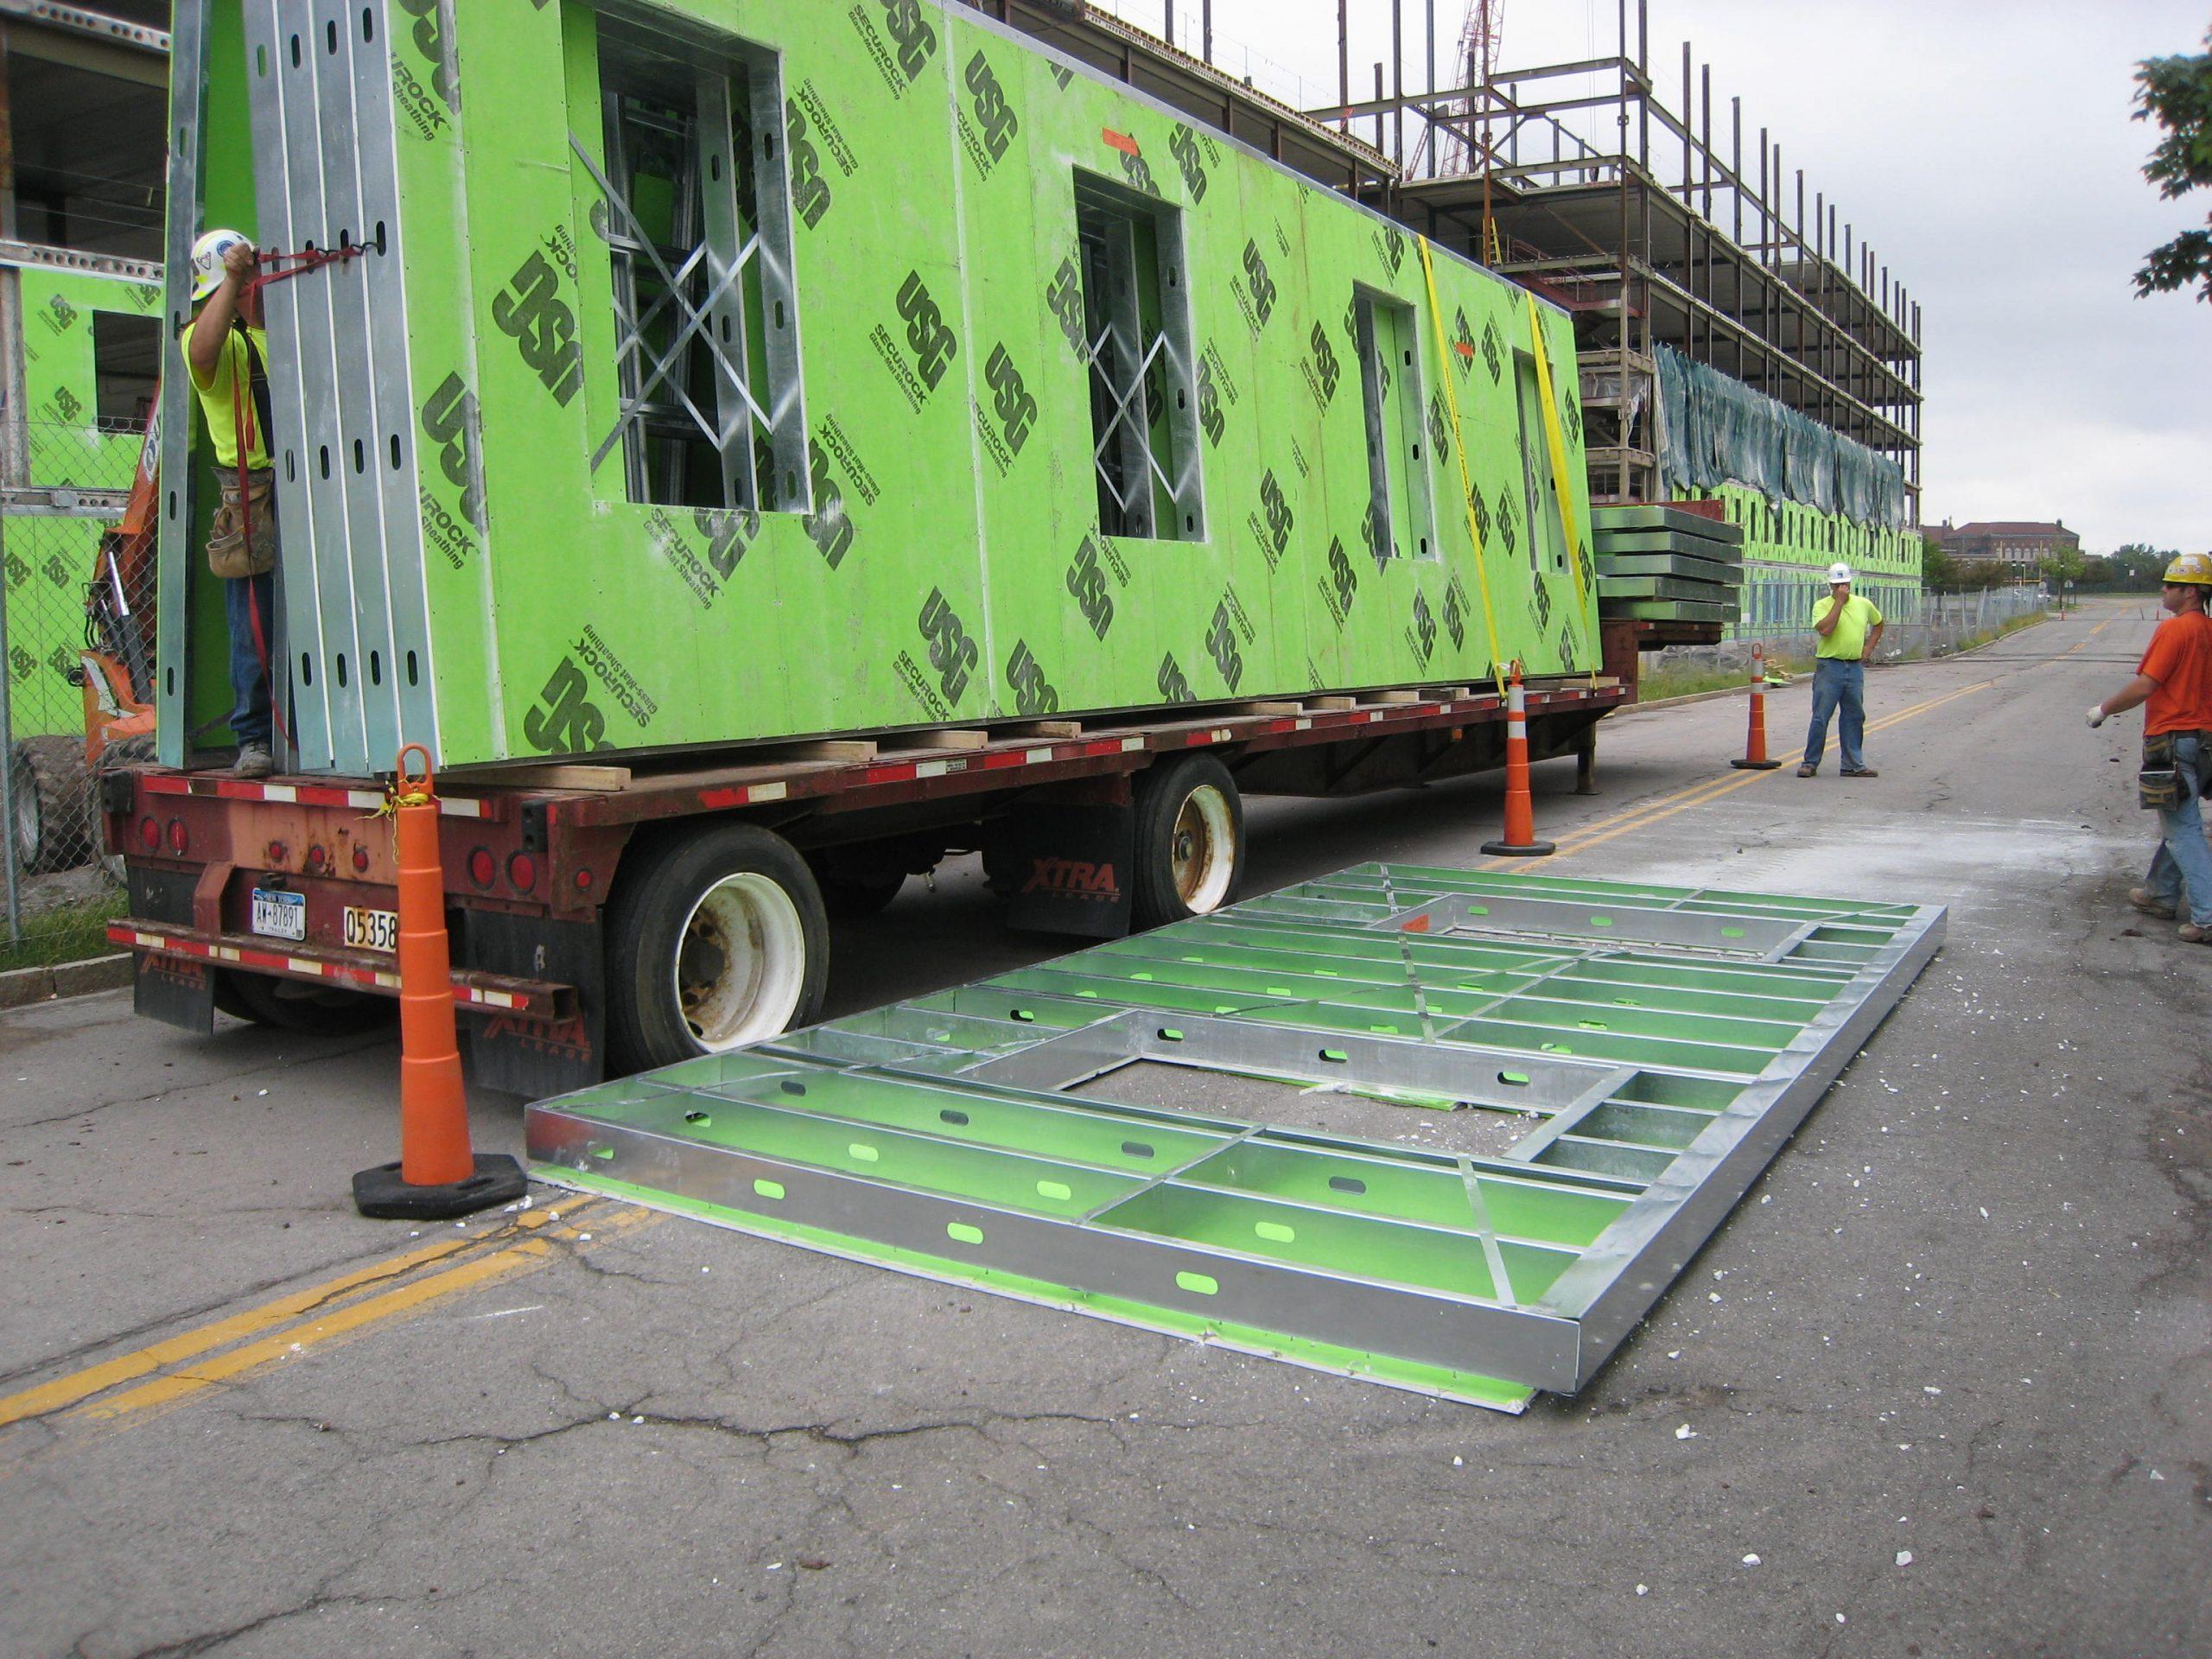 light gauge steel wall panels on a truck